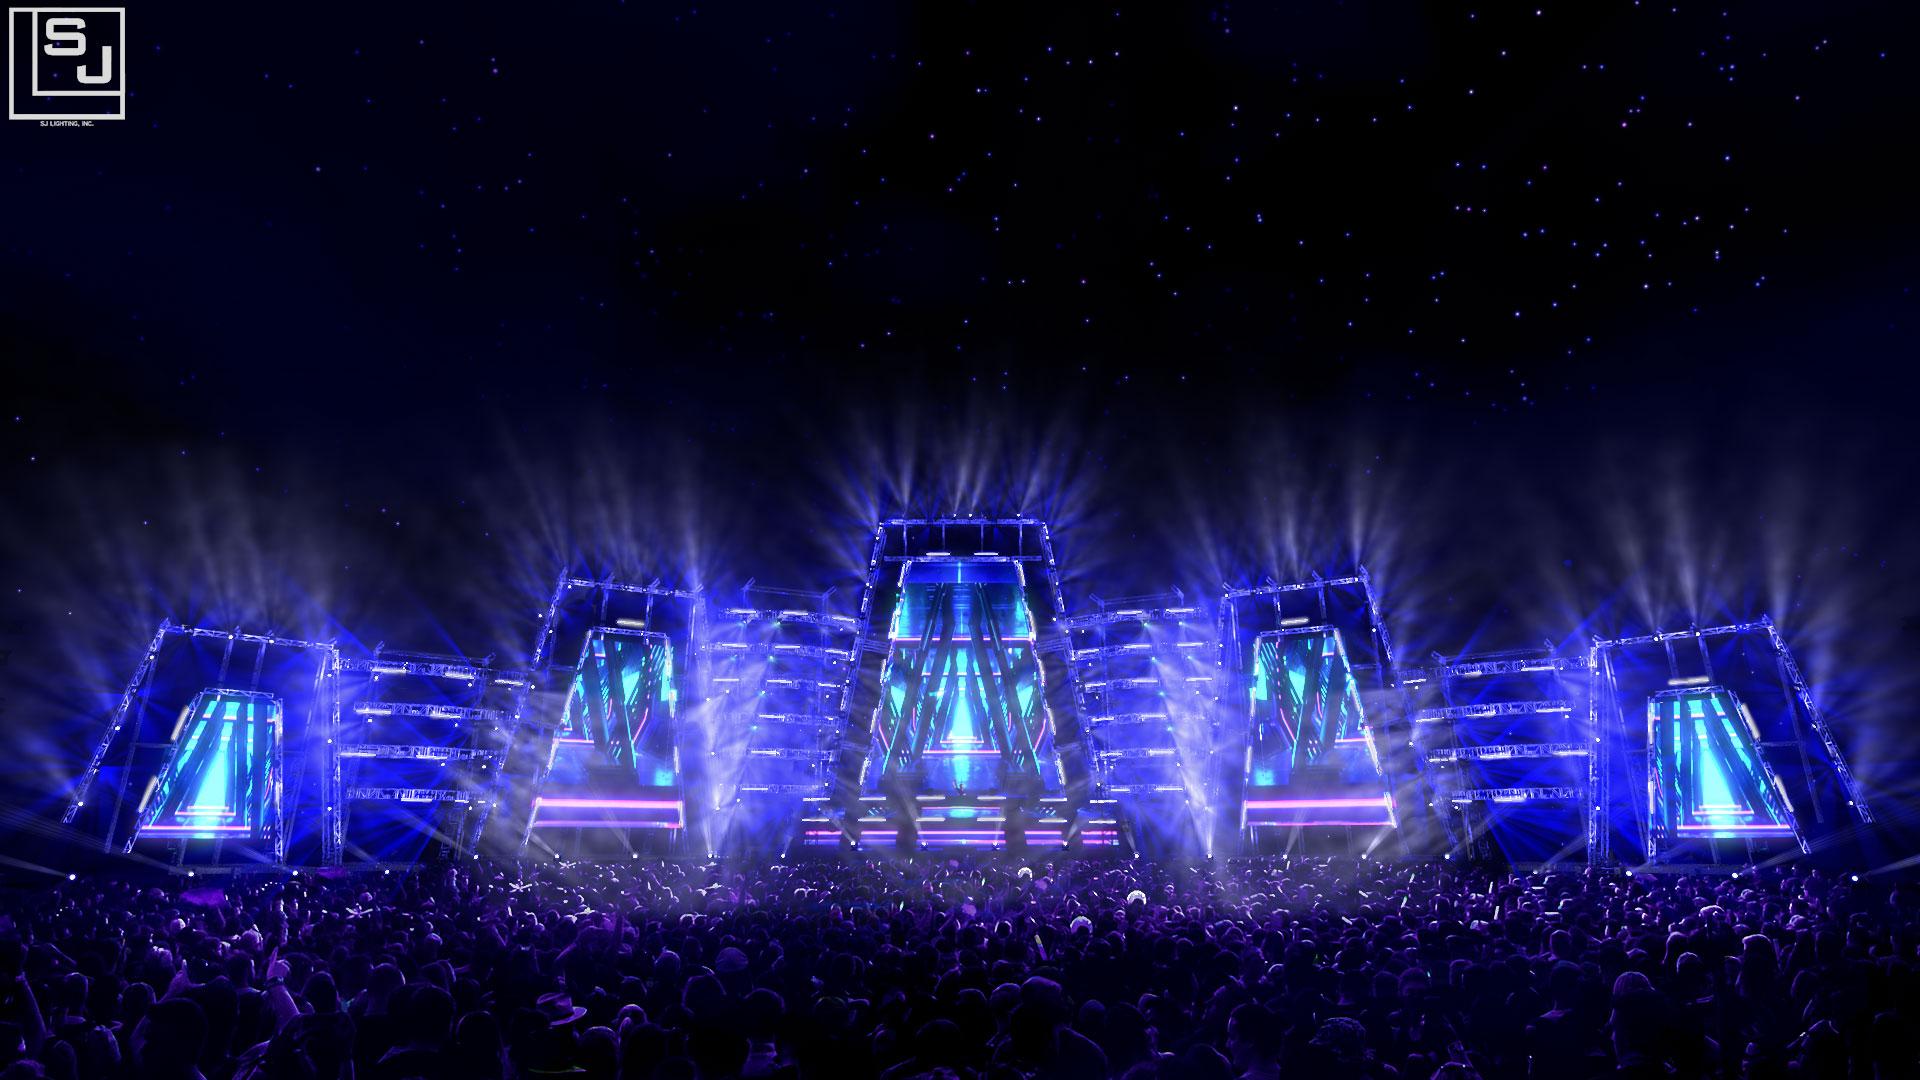 Music Led Lights